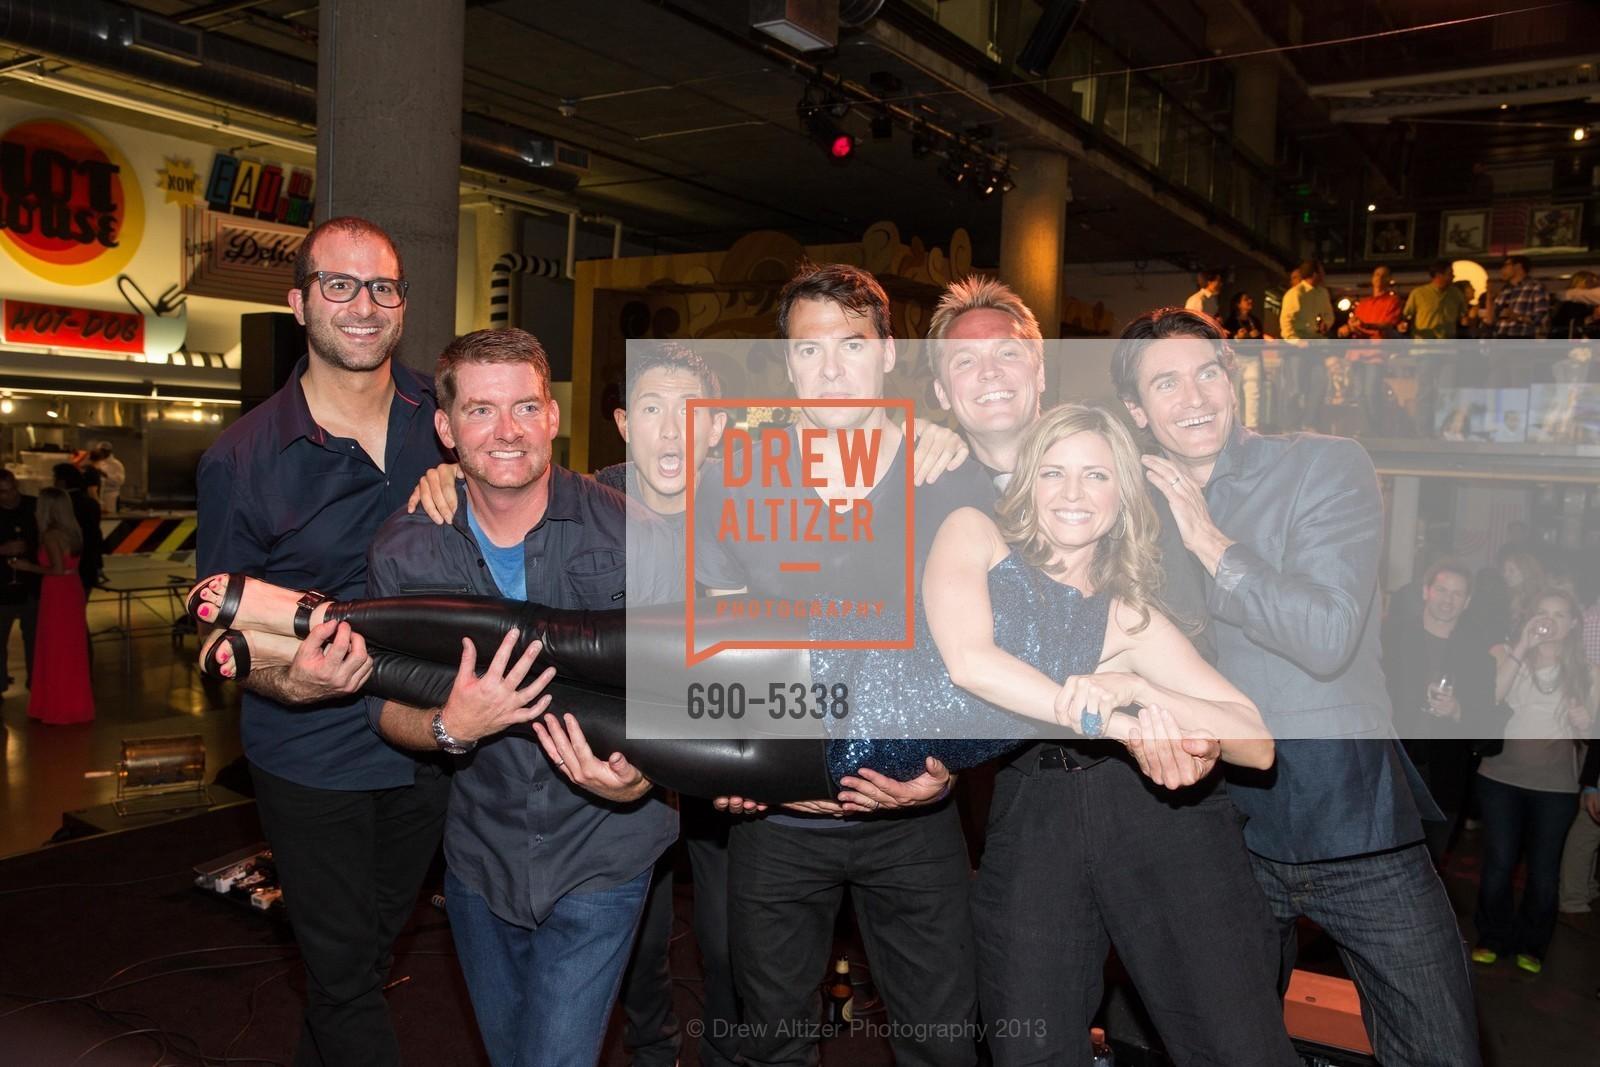 Philip Kaplan, Andy Barton, Chris Pan, Ethan Beard, Sarah Oliver, Kristian Segerstrale, Jack Dunham, Photo #690-5338